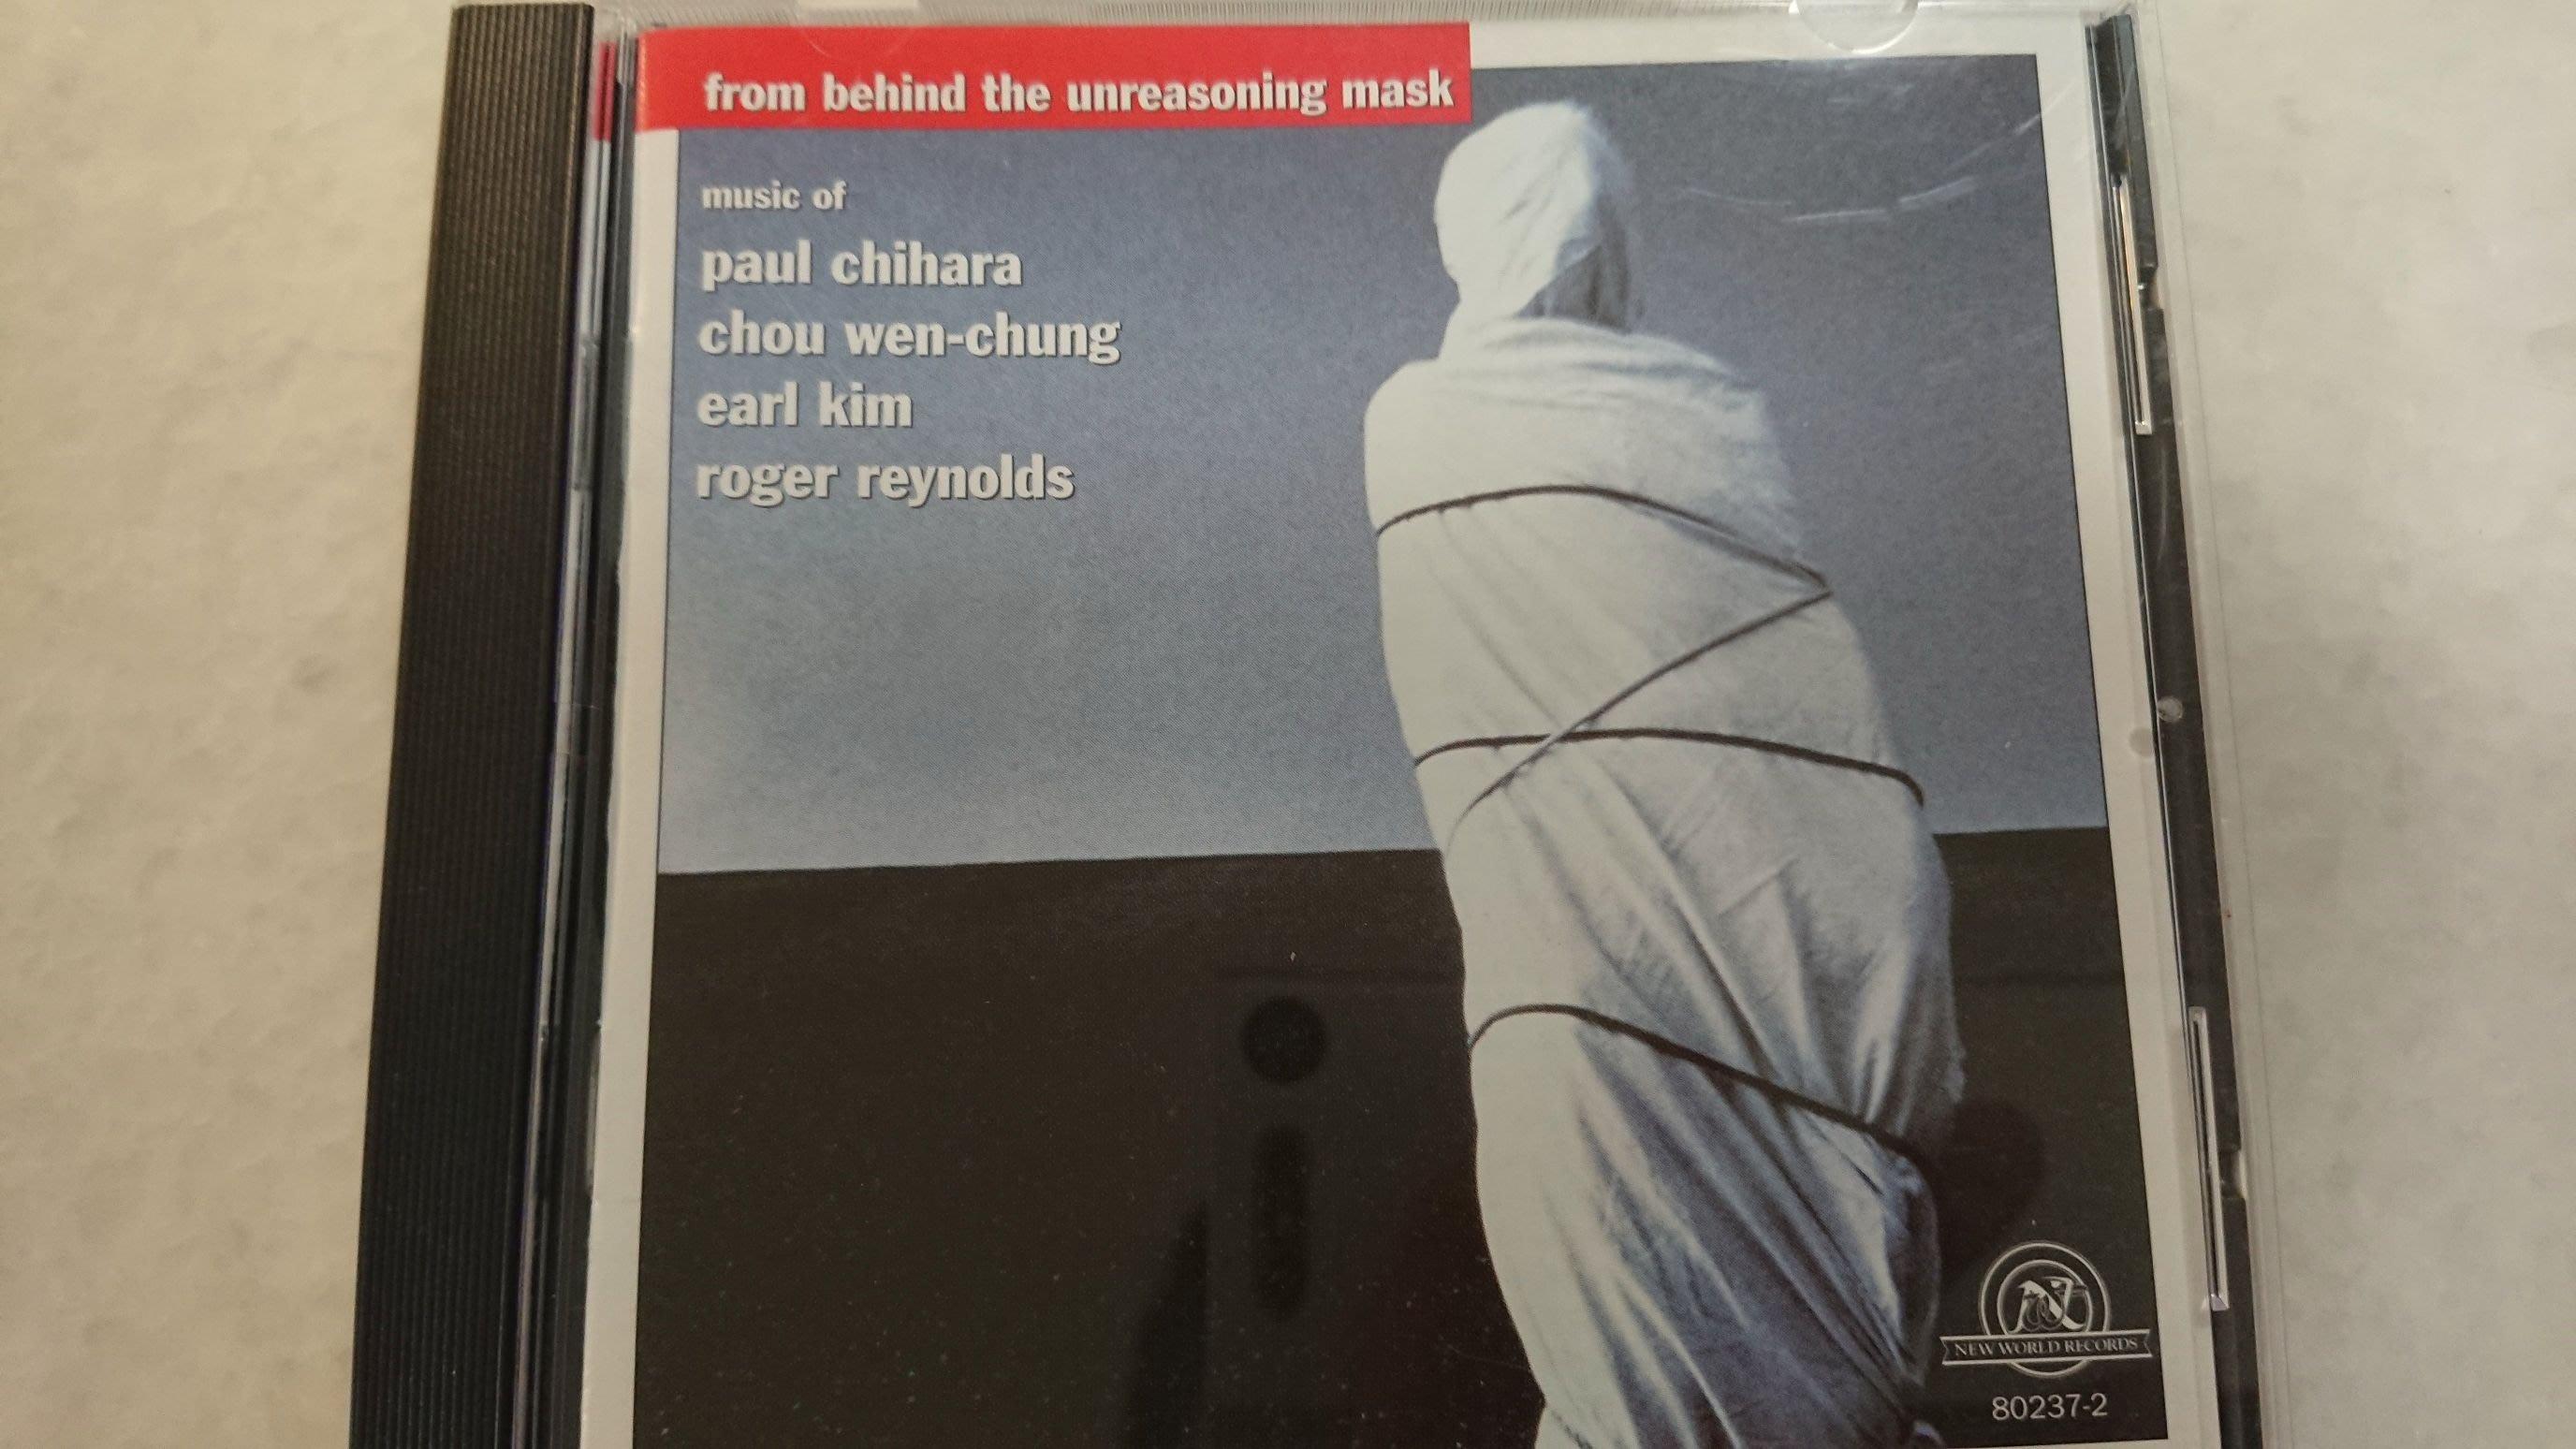 from behind the unreasoning mask music of paul chihara roger reynolds經典罕見發燒錄音爵士盤